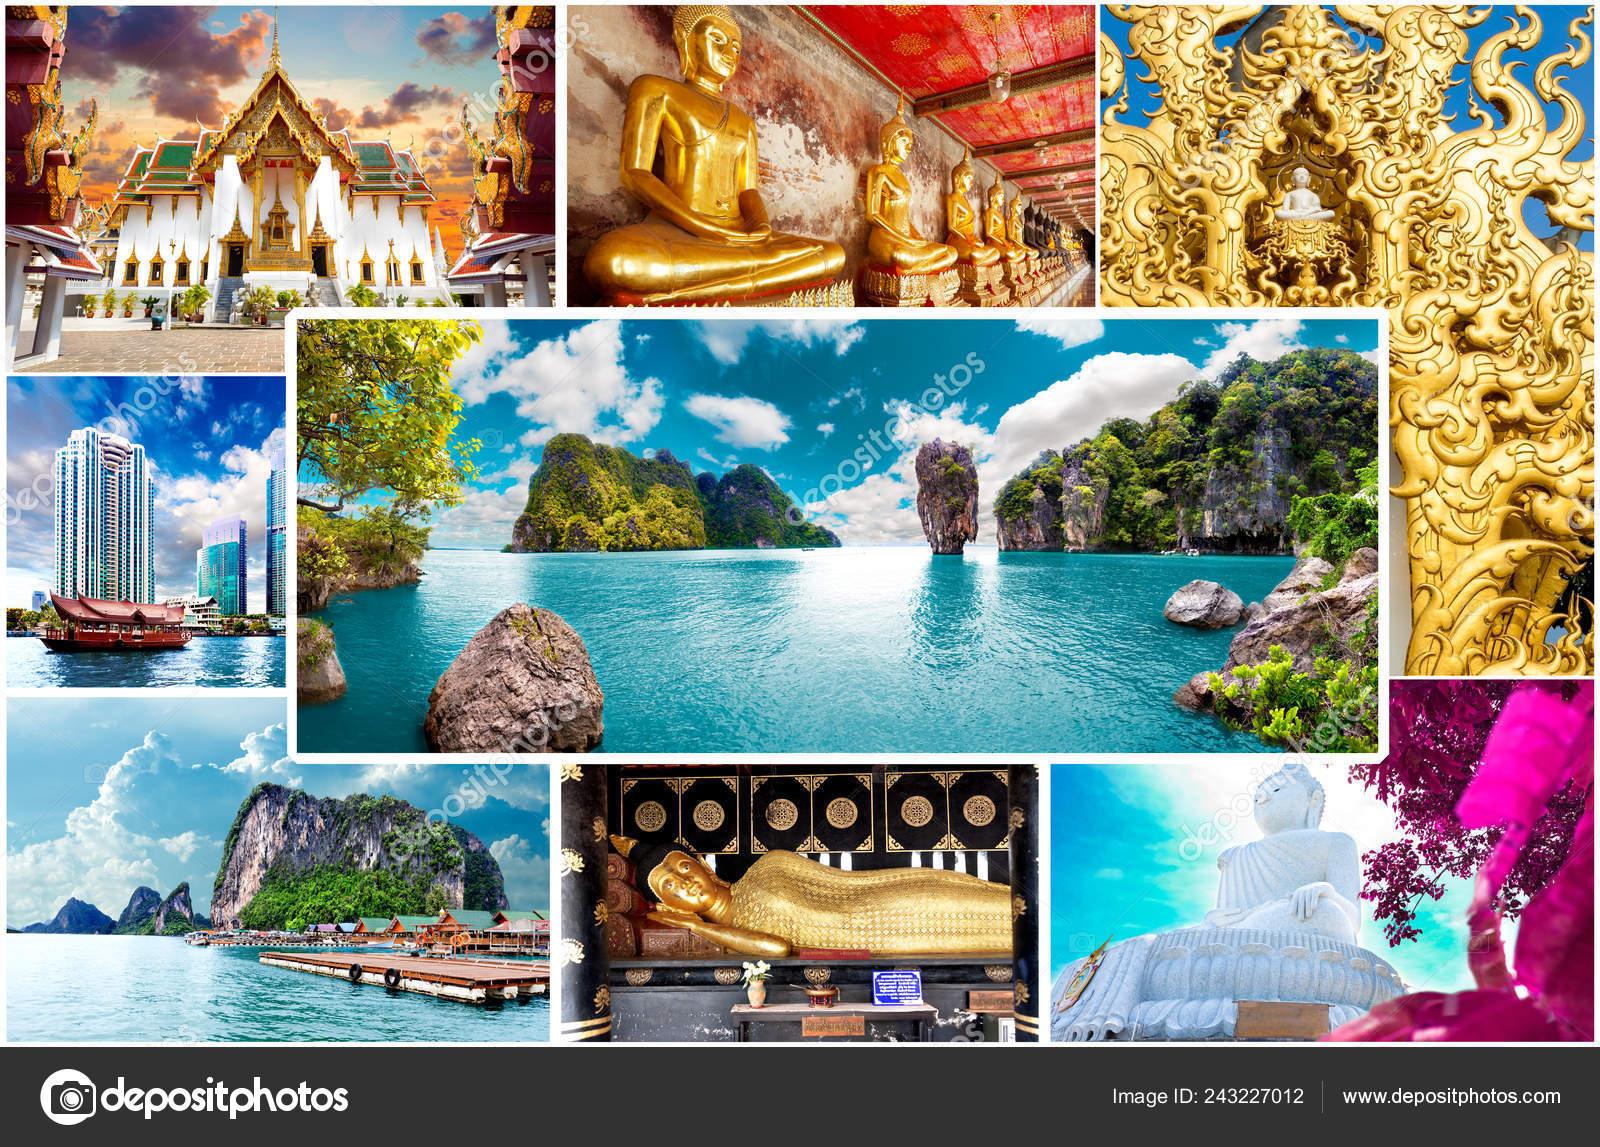 Thailand Phuket Collage Scenery Landscape Travel Concept Design Vacation Holidays Stock Photo Image By C Carloscastilla 243227012